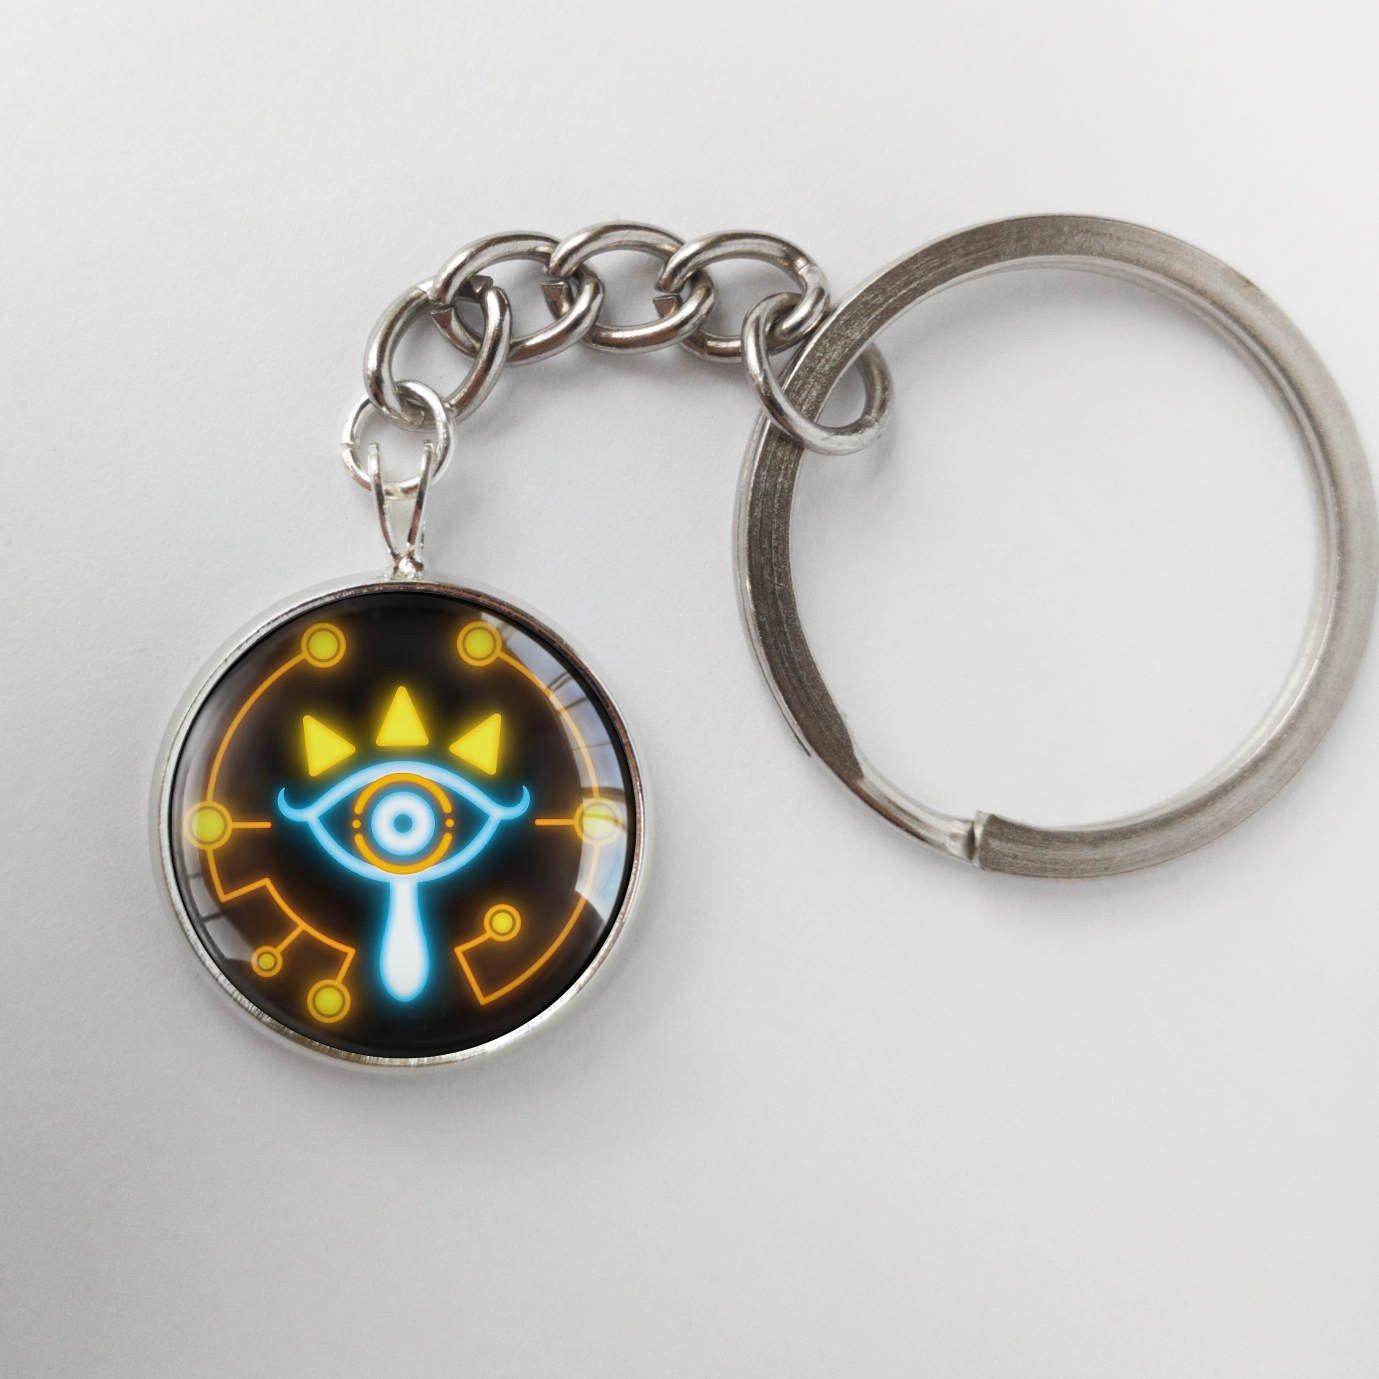 Sheikah Slate Template Zelda Botw Sheikah Slate Eye Symbol Breath Of the Wild Key